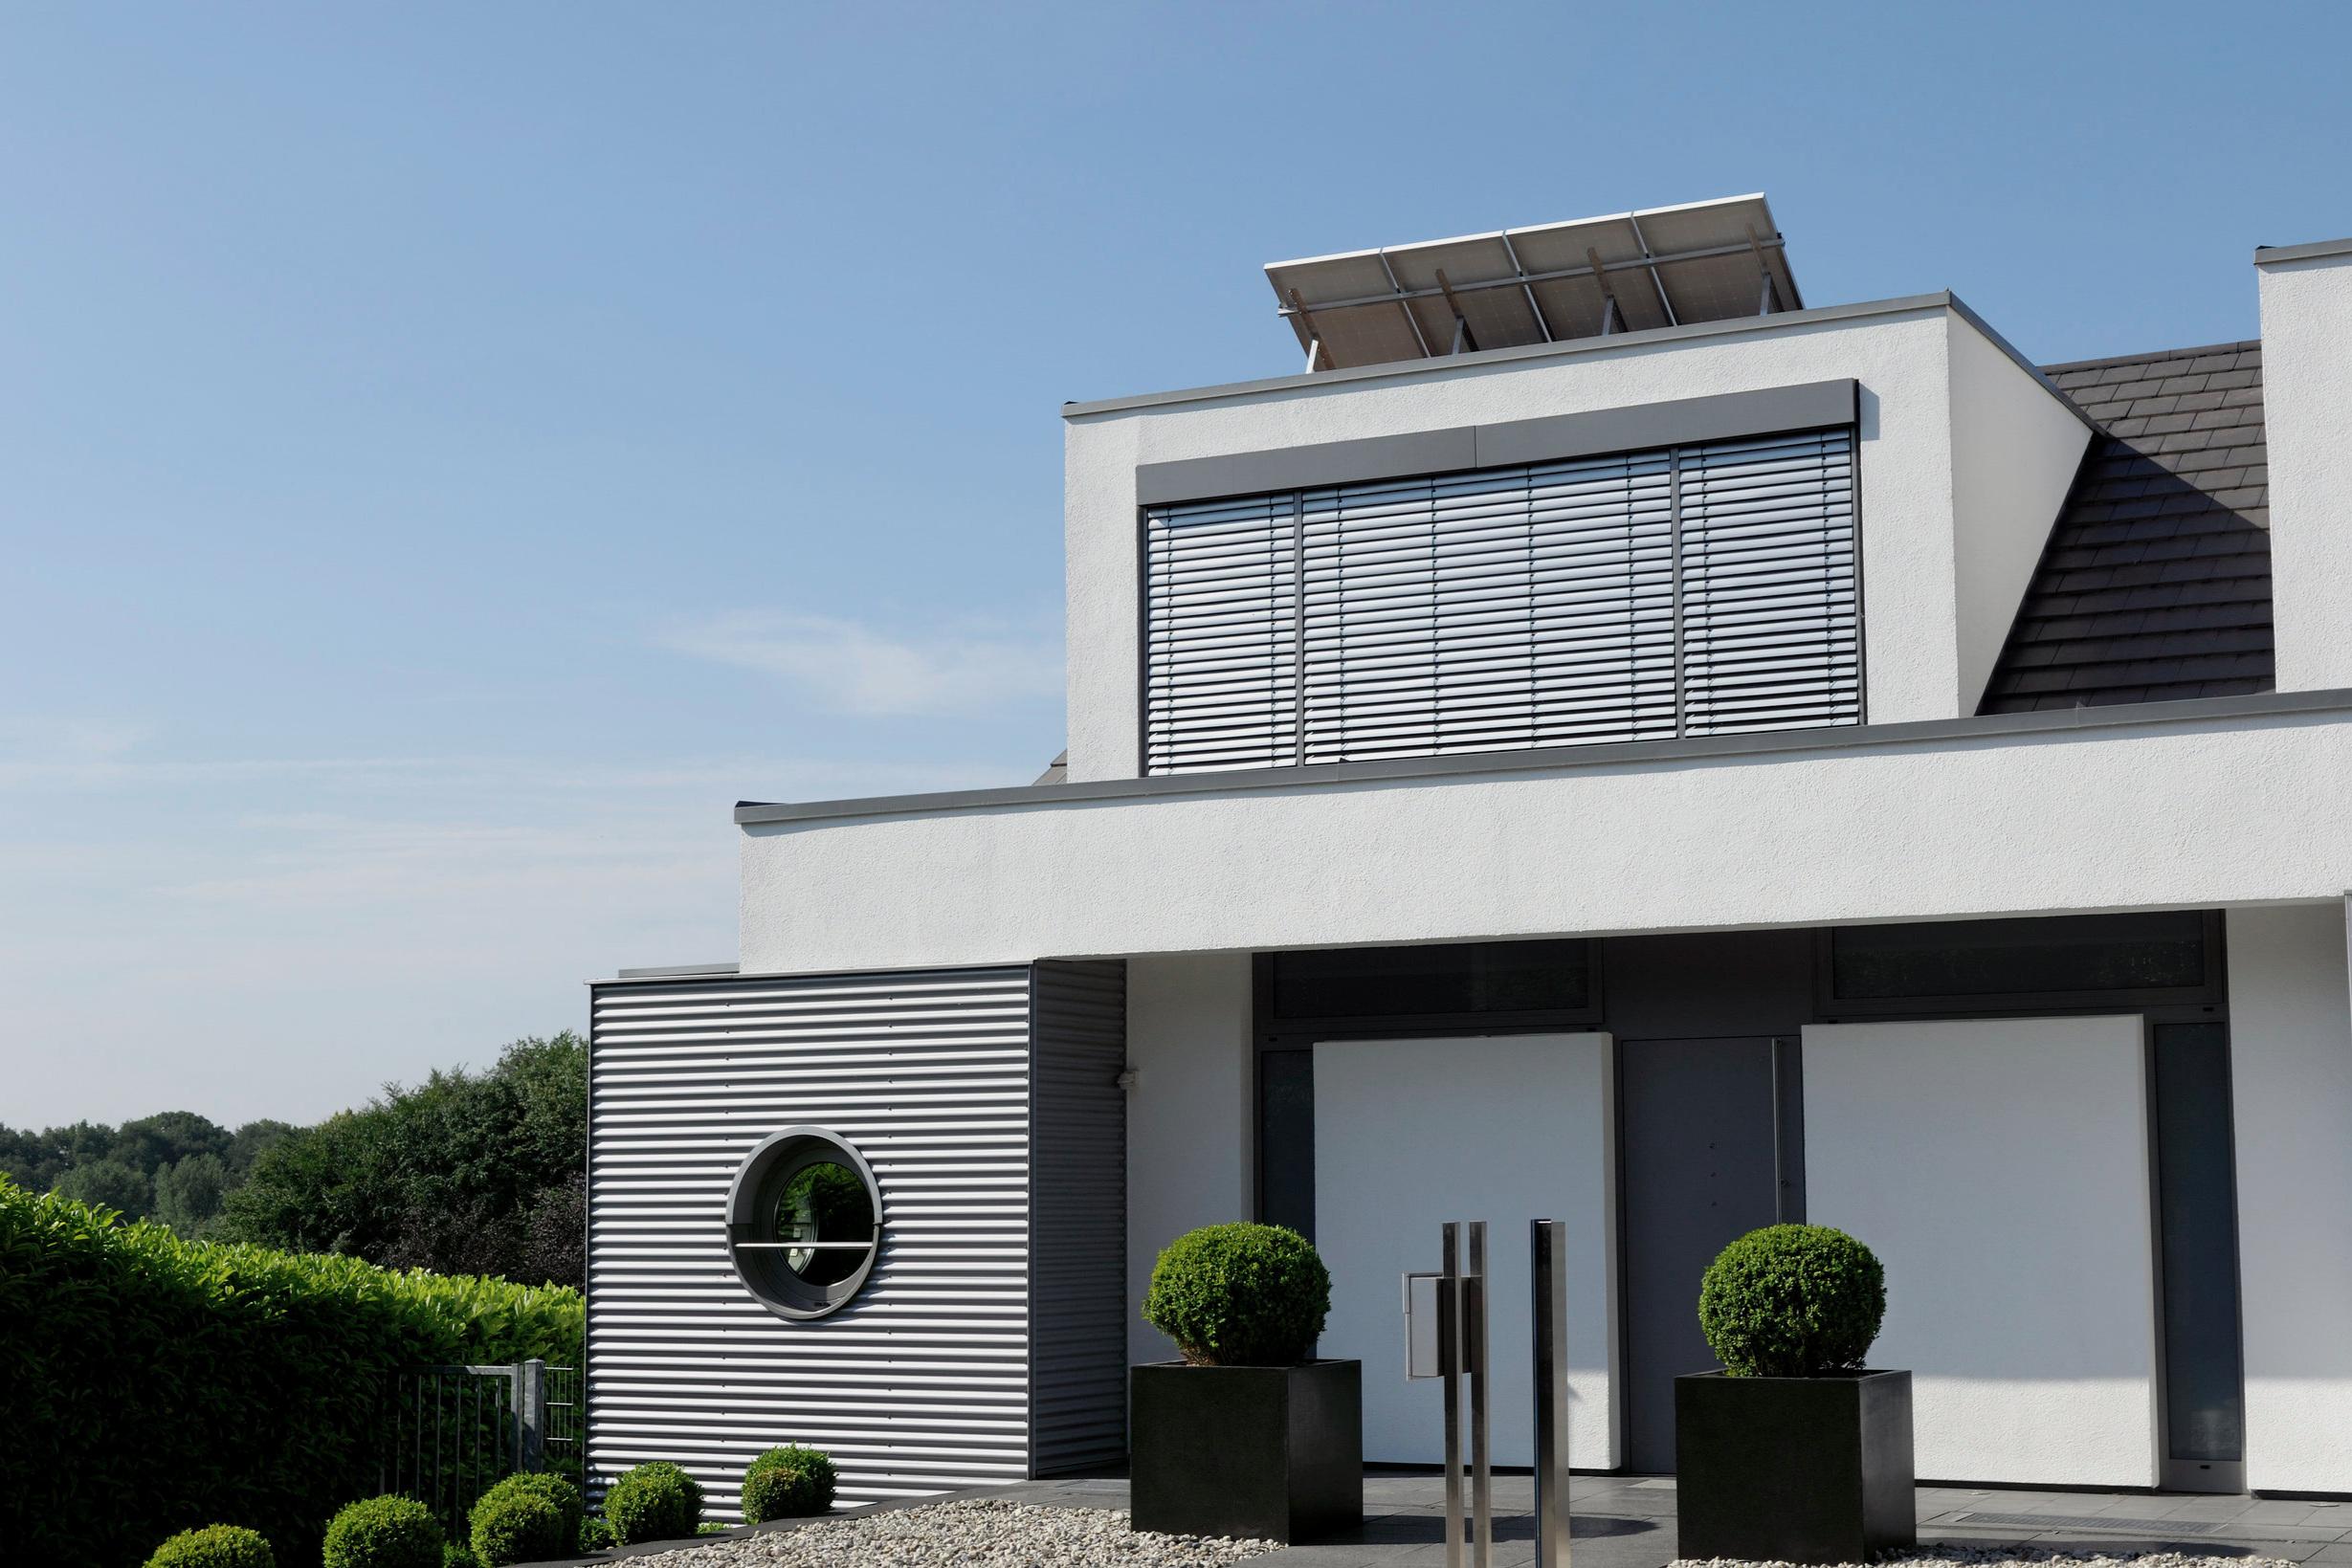 ENERGIEPLANUNG | ARCHITEKTURPROJEKTE | KAMPAGNEN -